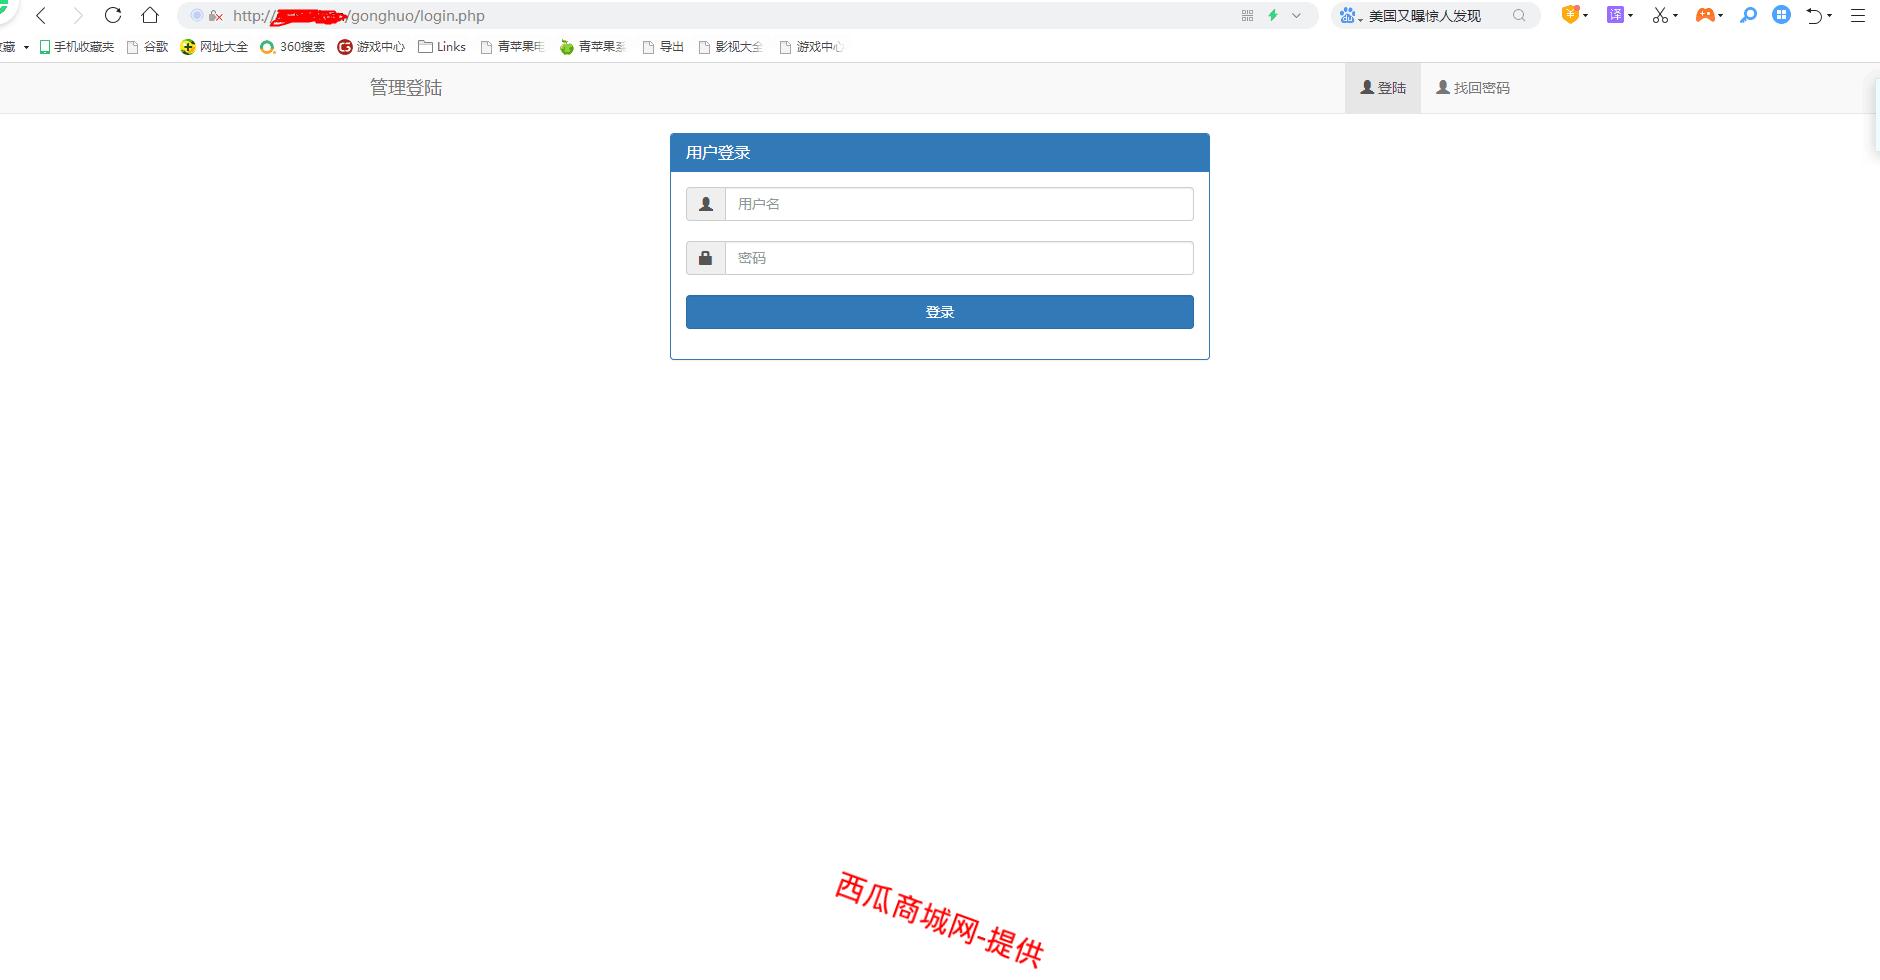 QQ皇族馆-最新版代刷带供货商和砍价功能全解无加密